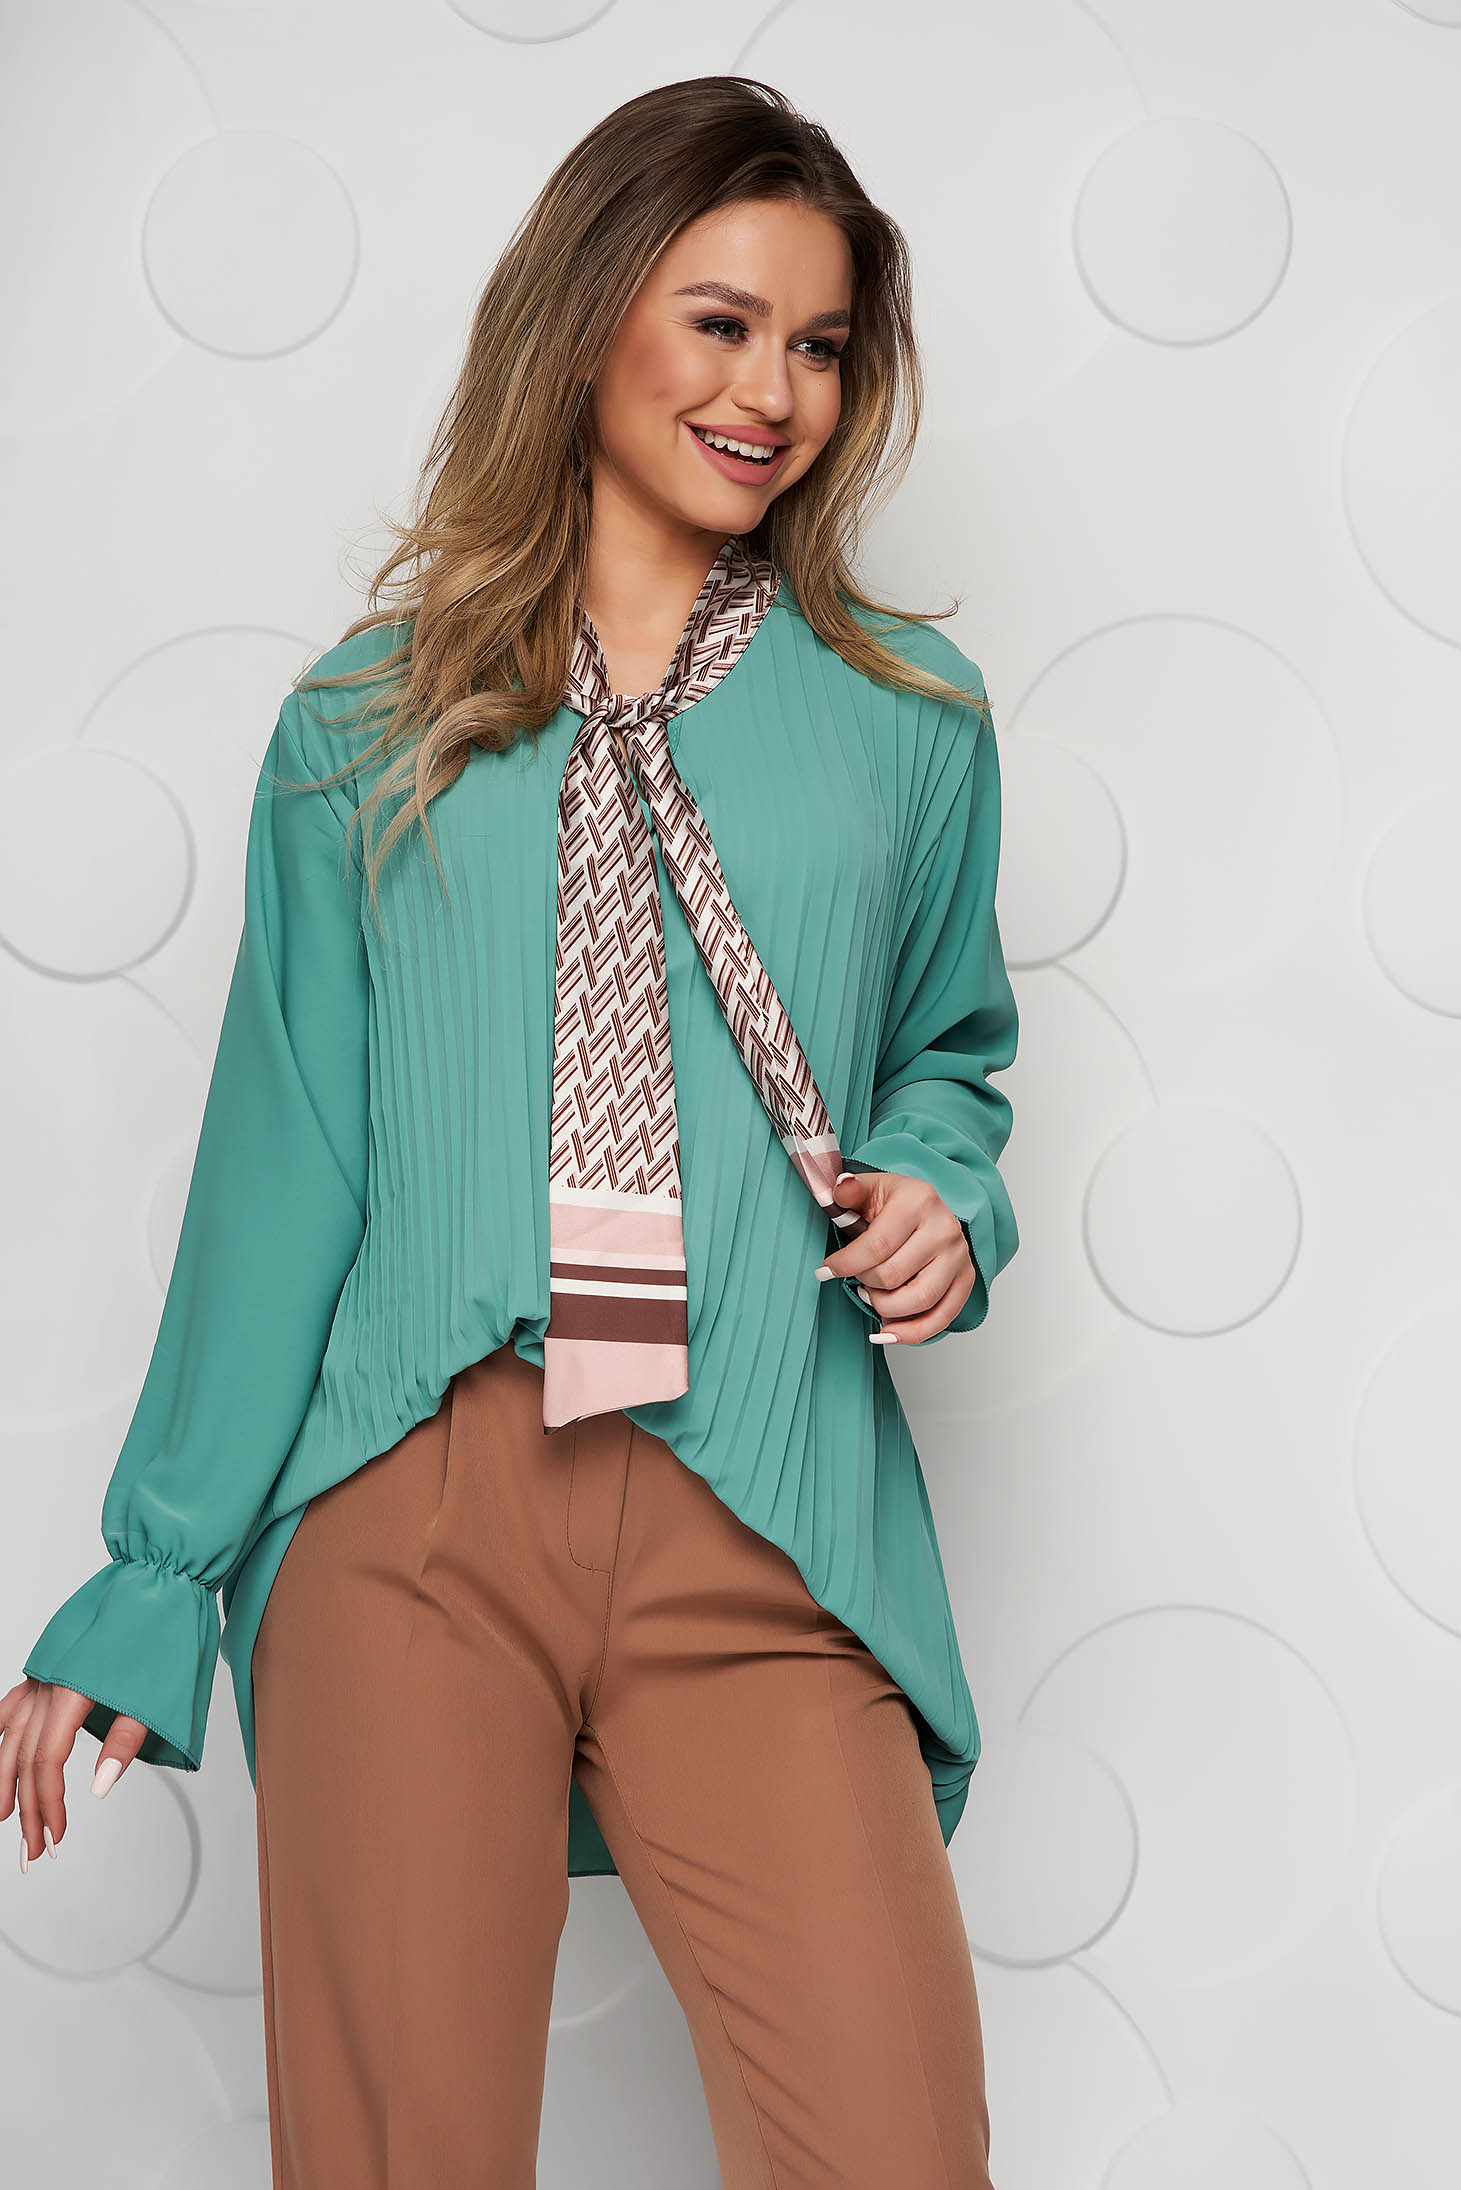 Bluza dama SunShine verde office cu croi larg plisata cu guler tip esarfa